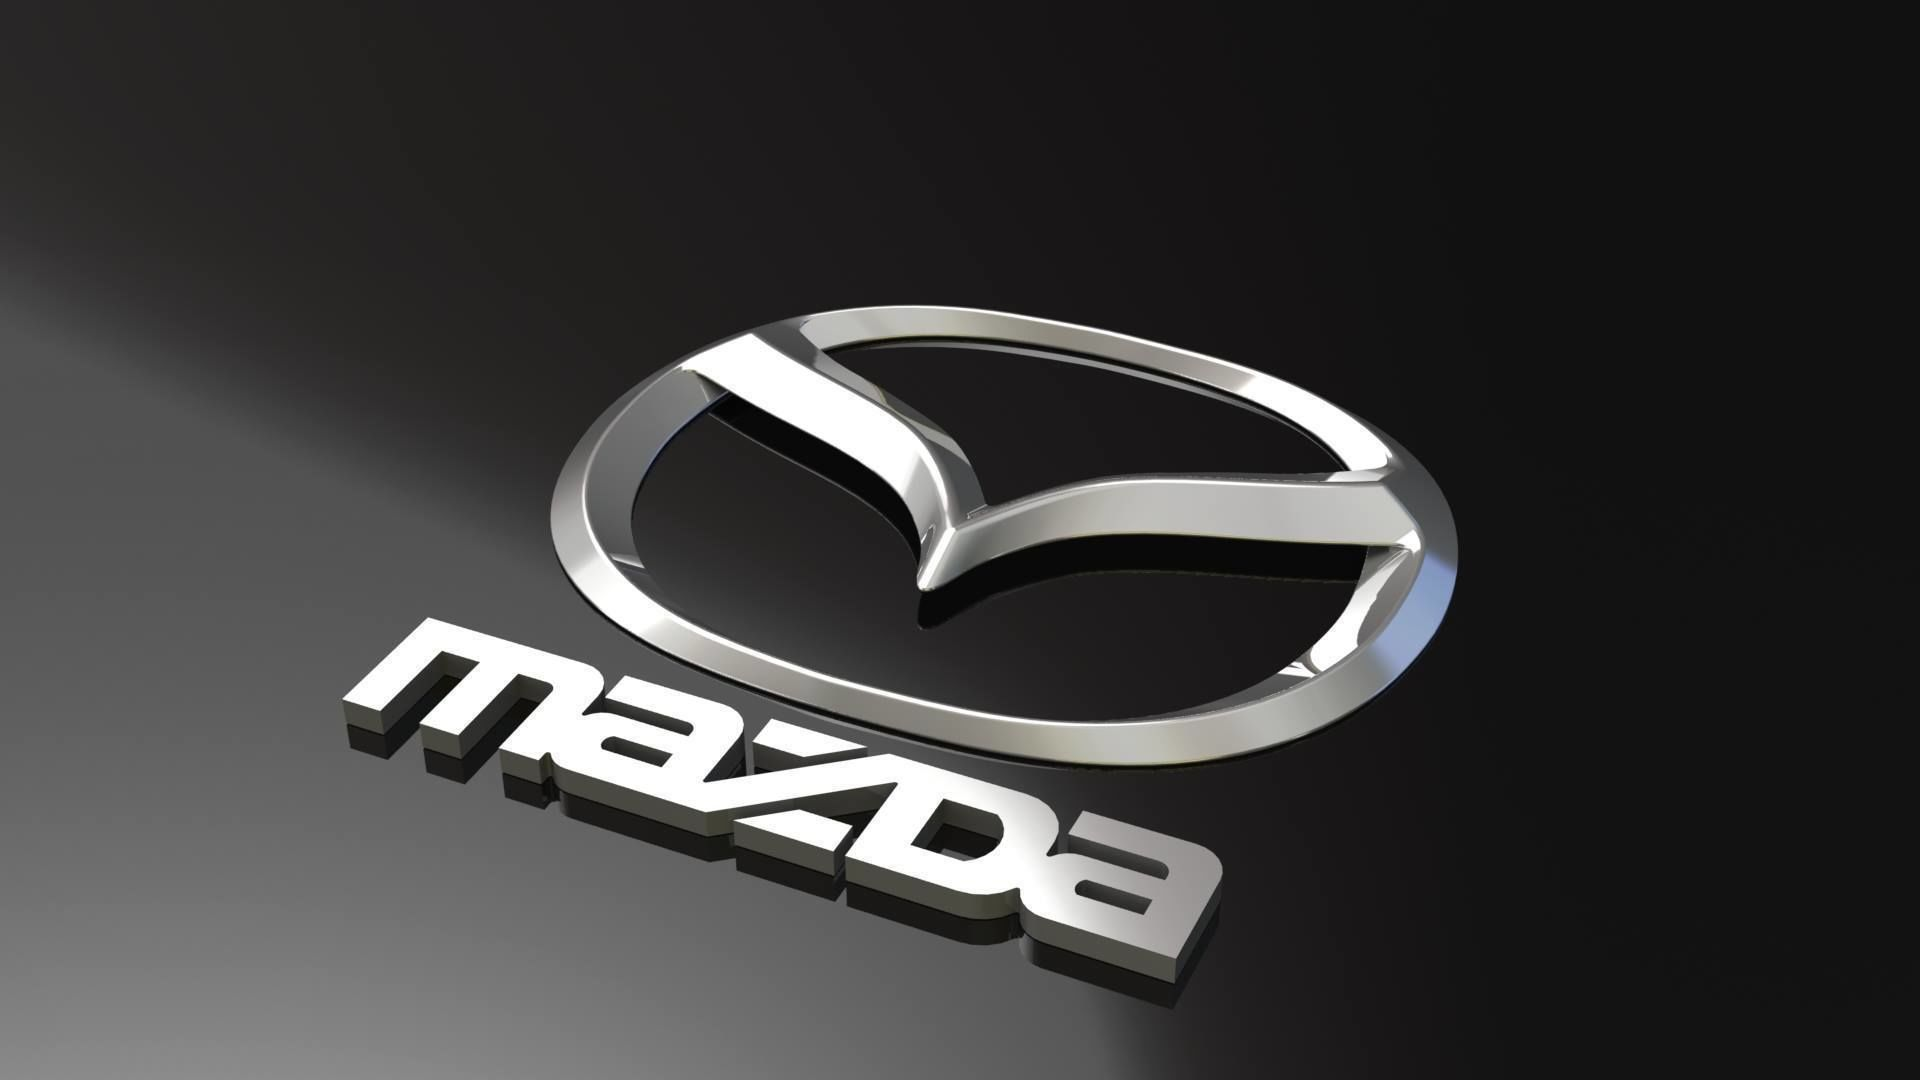 Mazda ищет кредиты на $3 миллиарда для преодоления пандемии